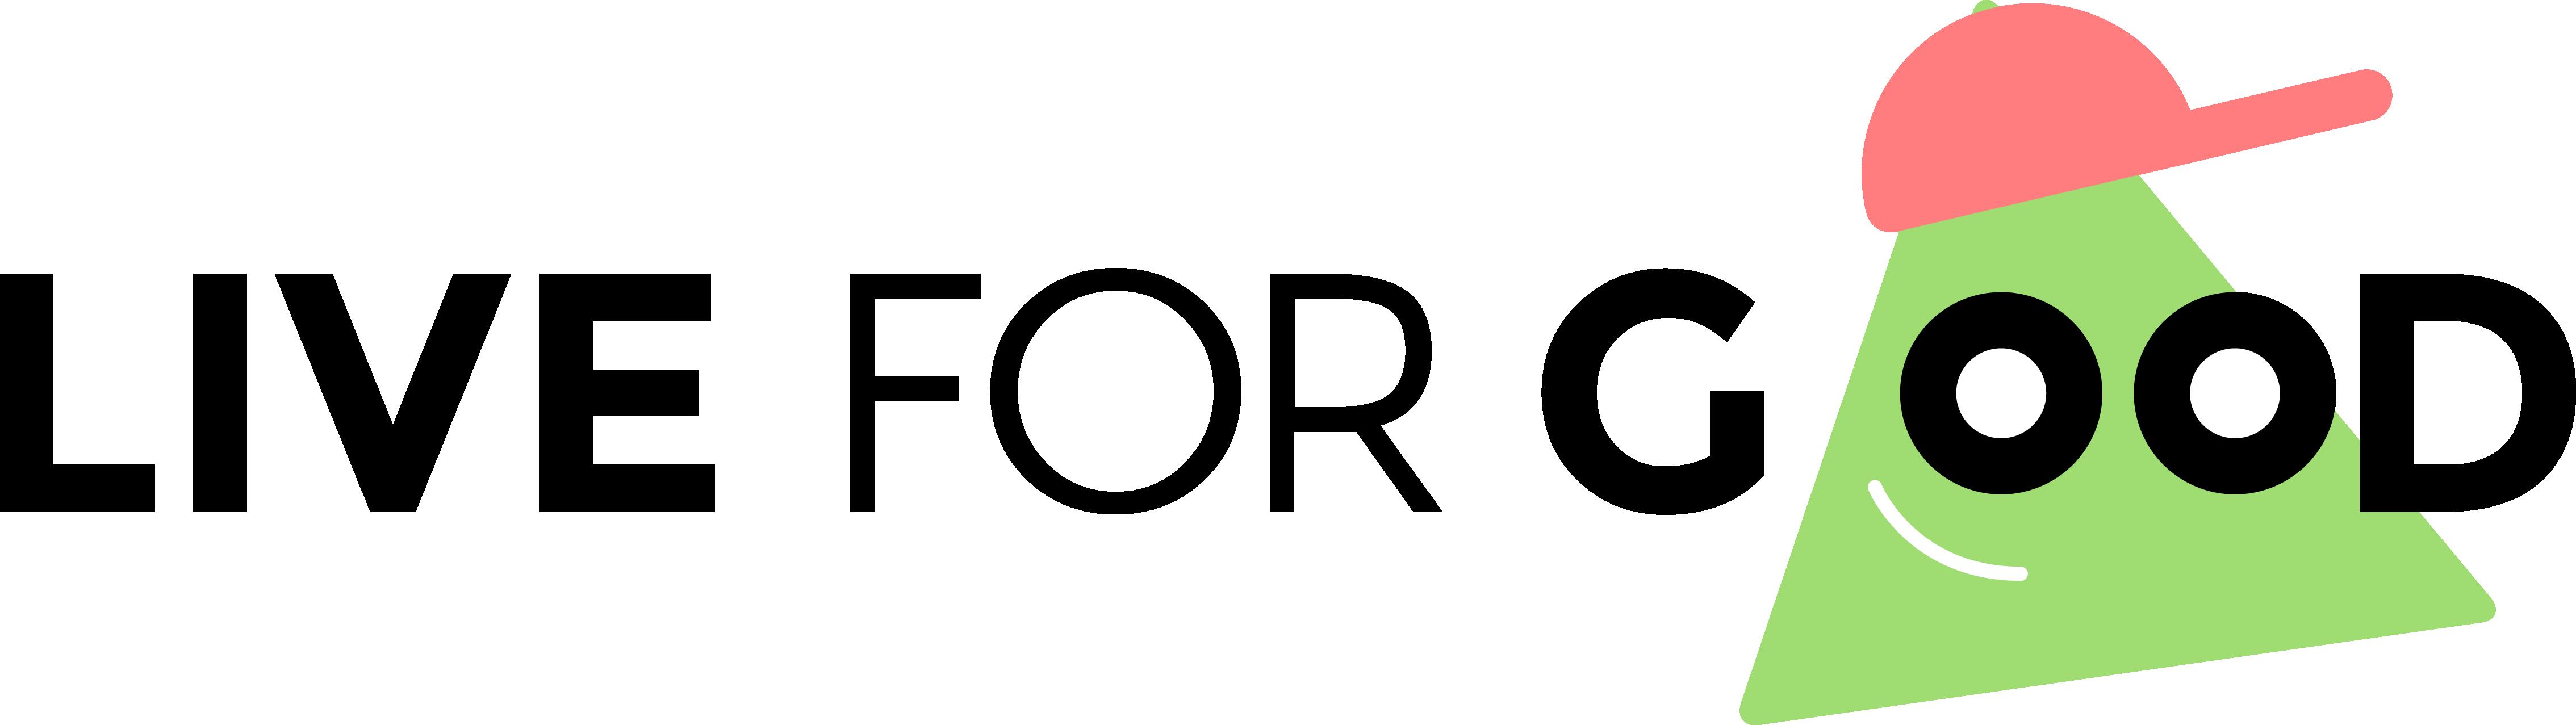 liveforgood logo